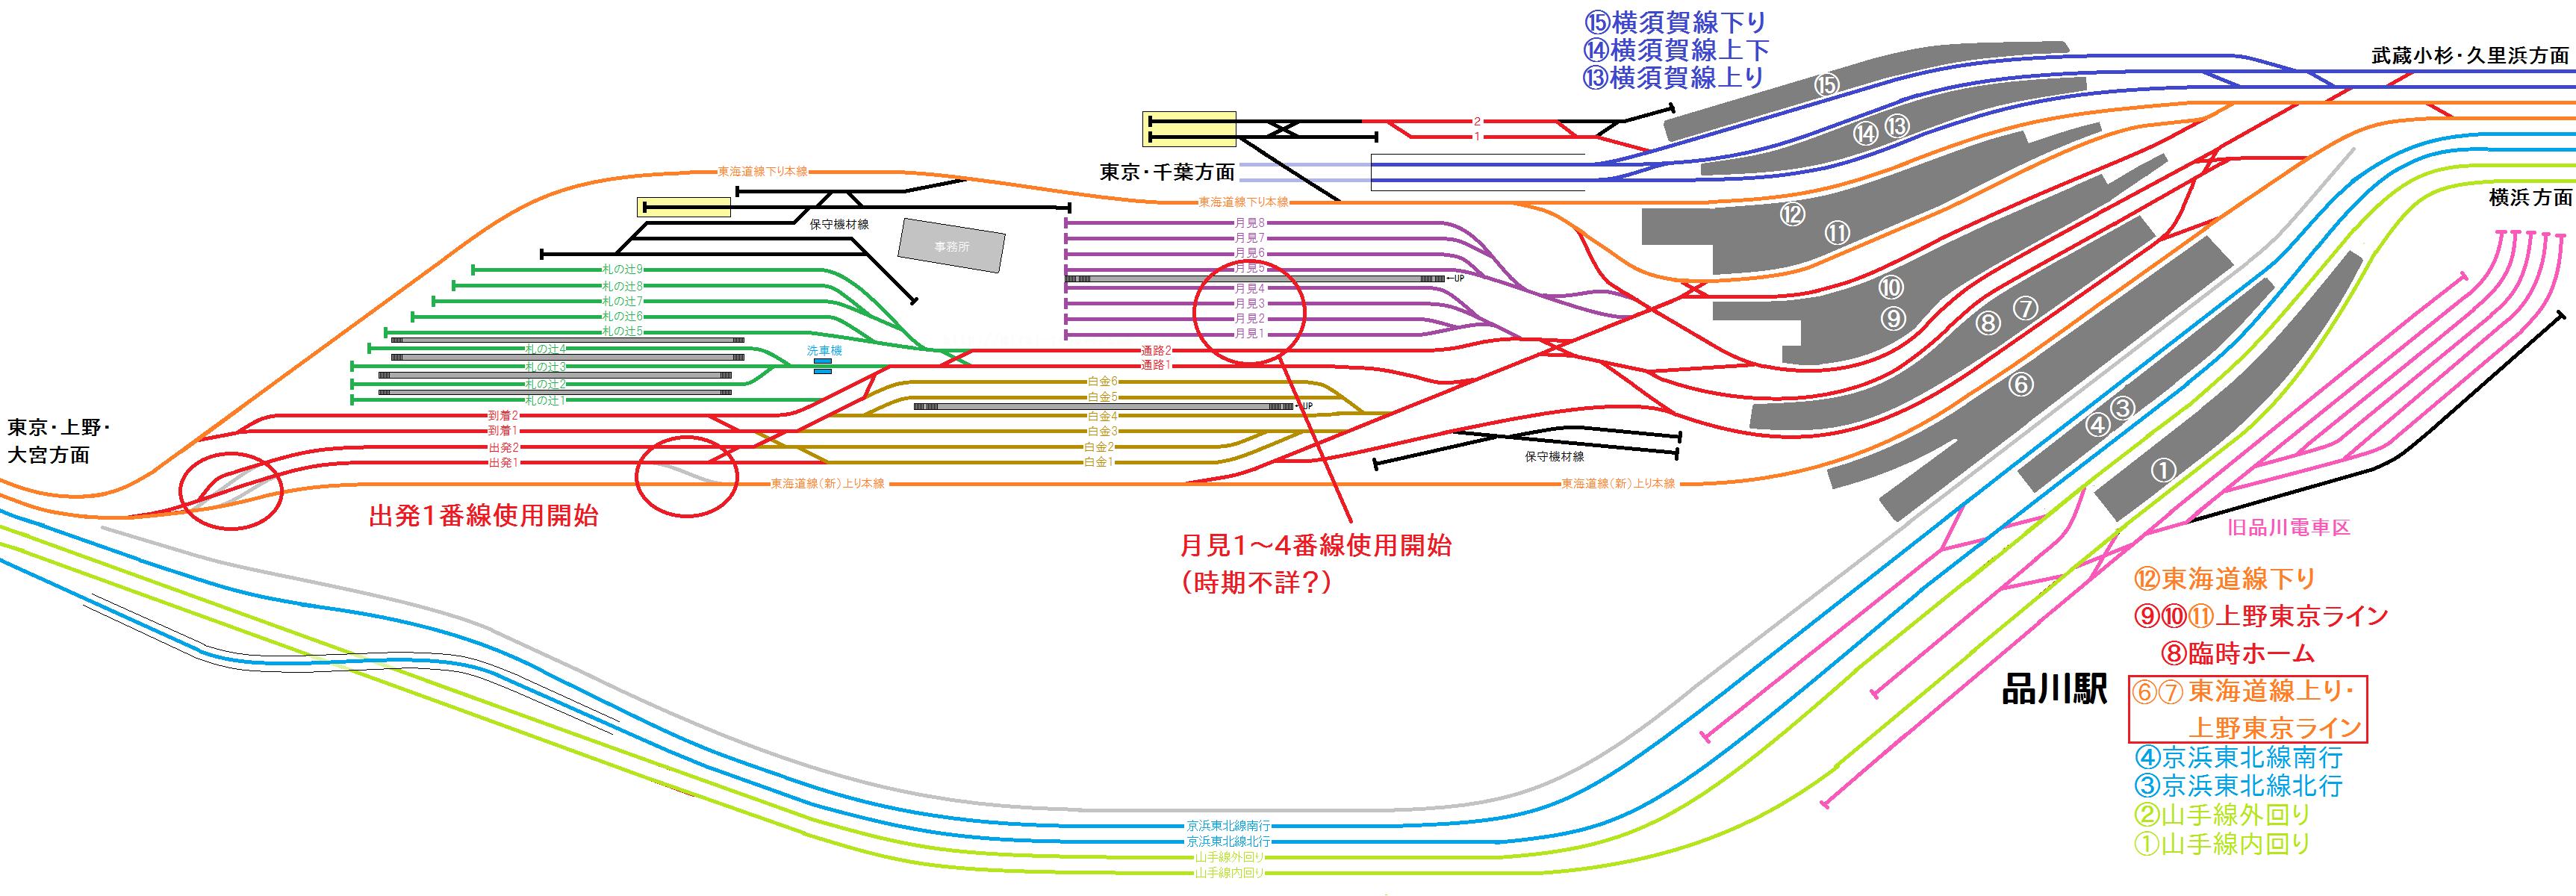 2016年11月以降の品川駅構内配線図